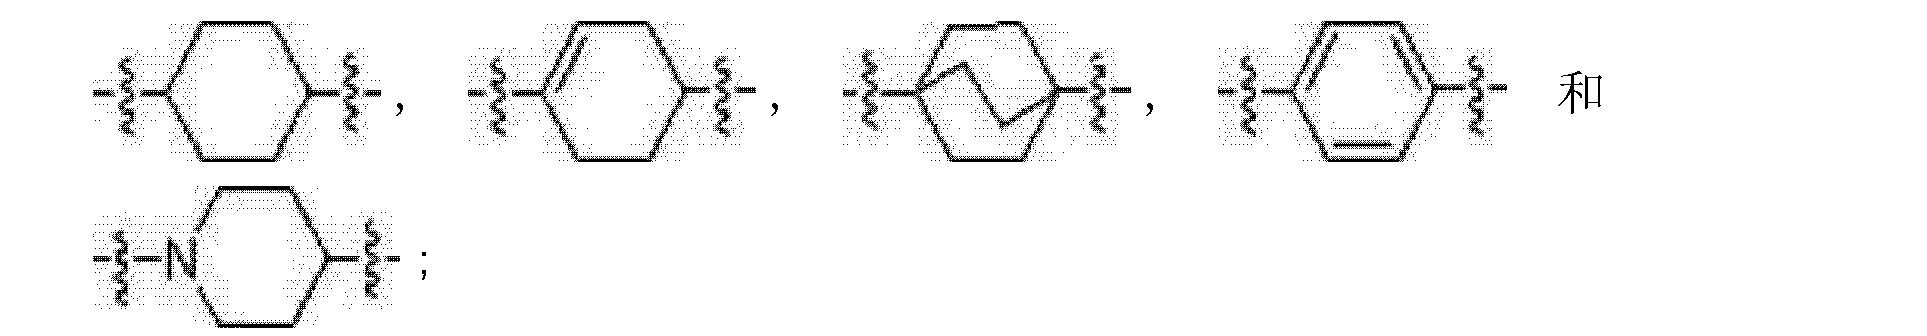 Figure CN102378762AD00291